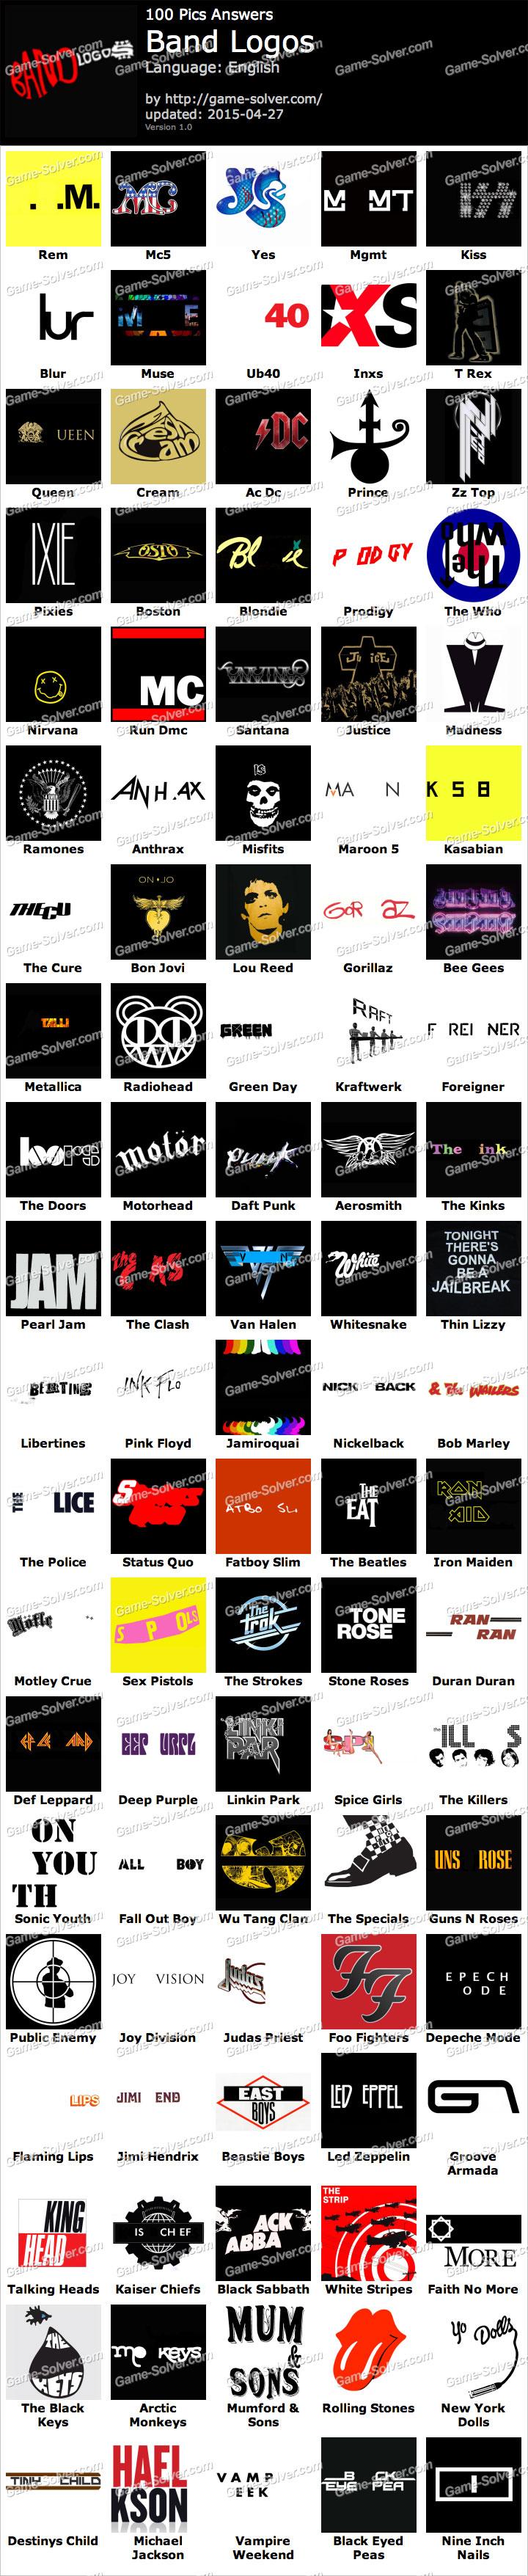 100 pics band logos game solver. Black Bedroom Furniture Sets. Home Design Ideas